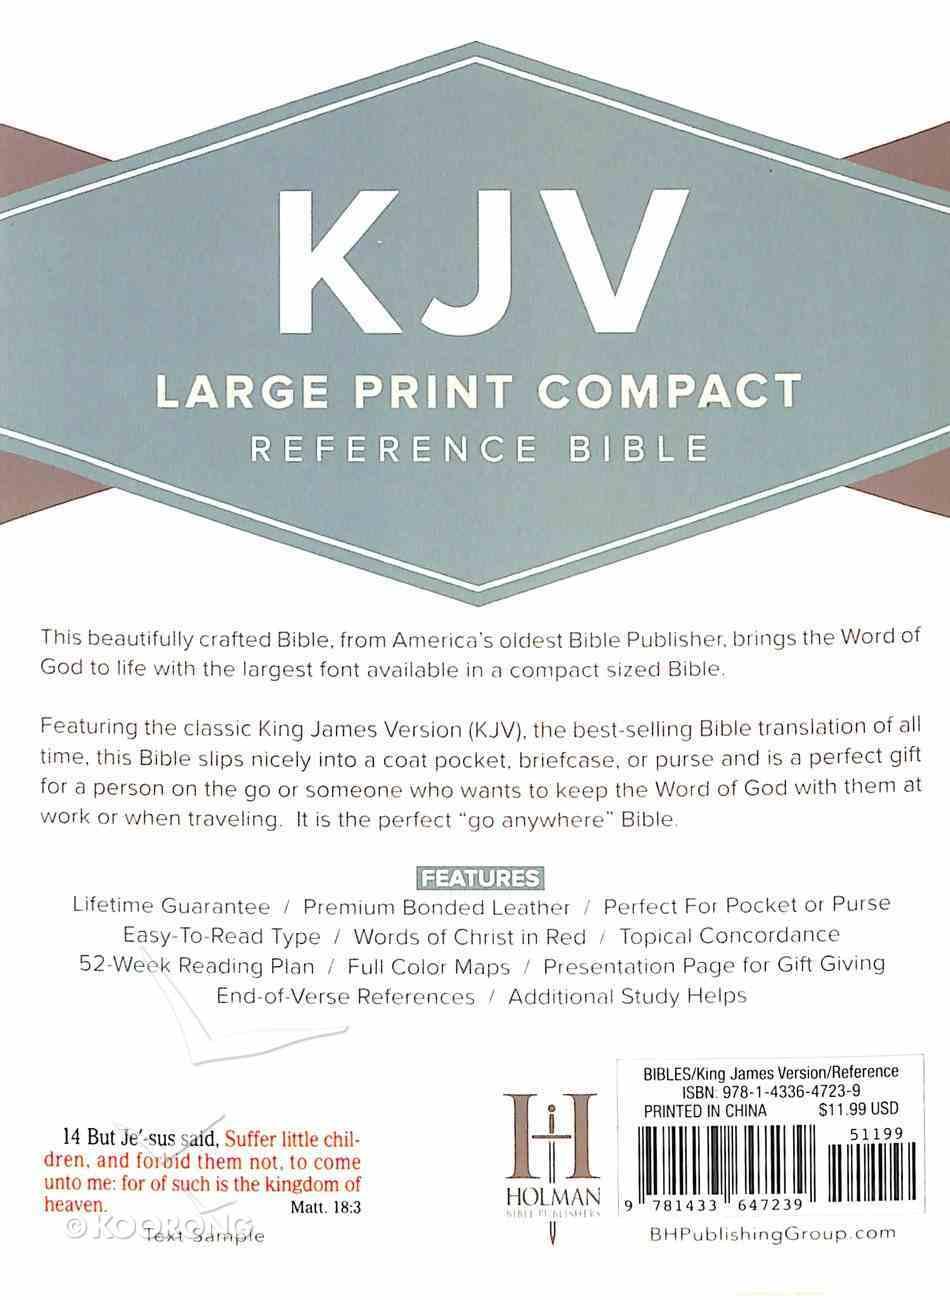 KJV Large Print Compact Reference Bible Black Bonded Leather